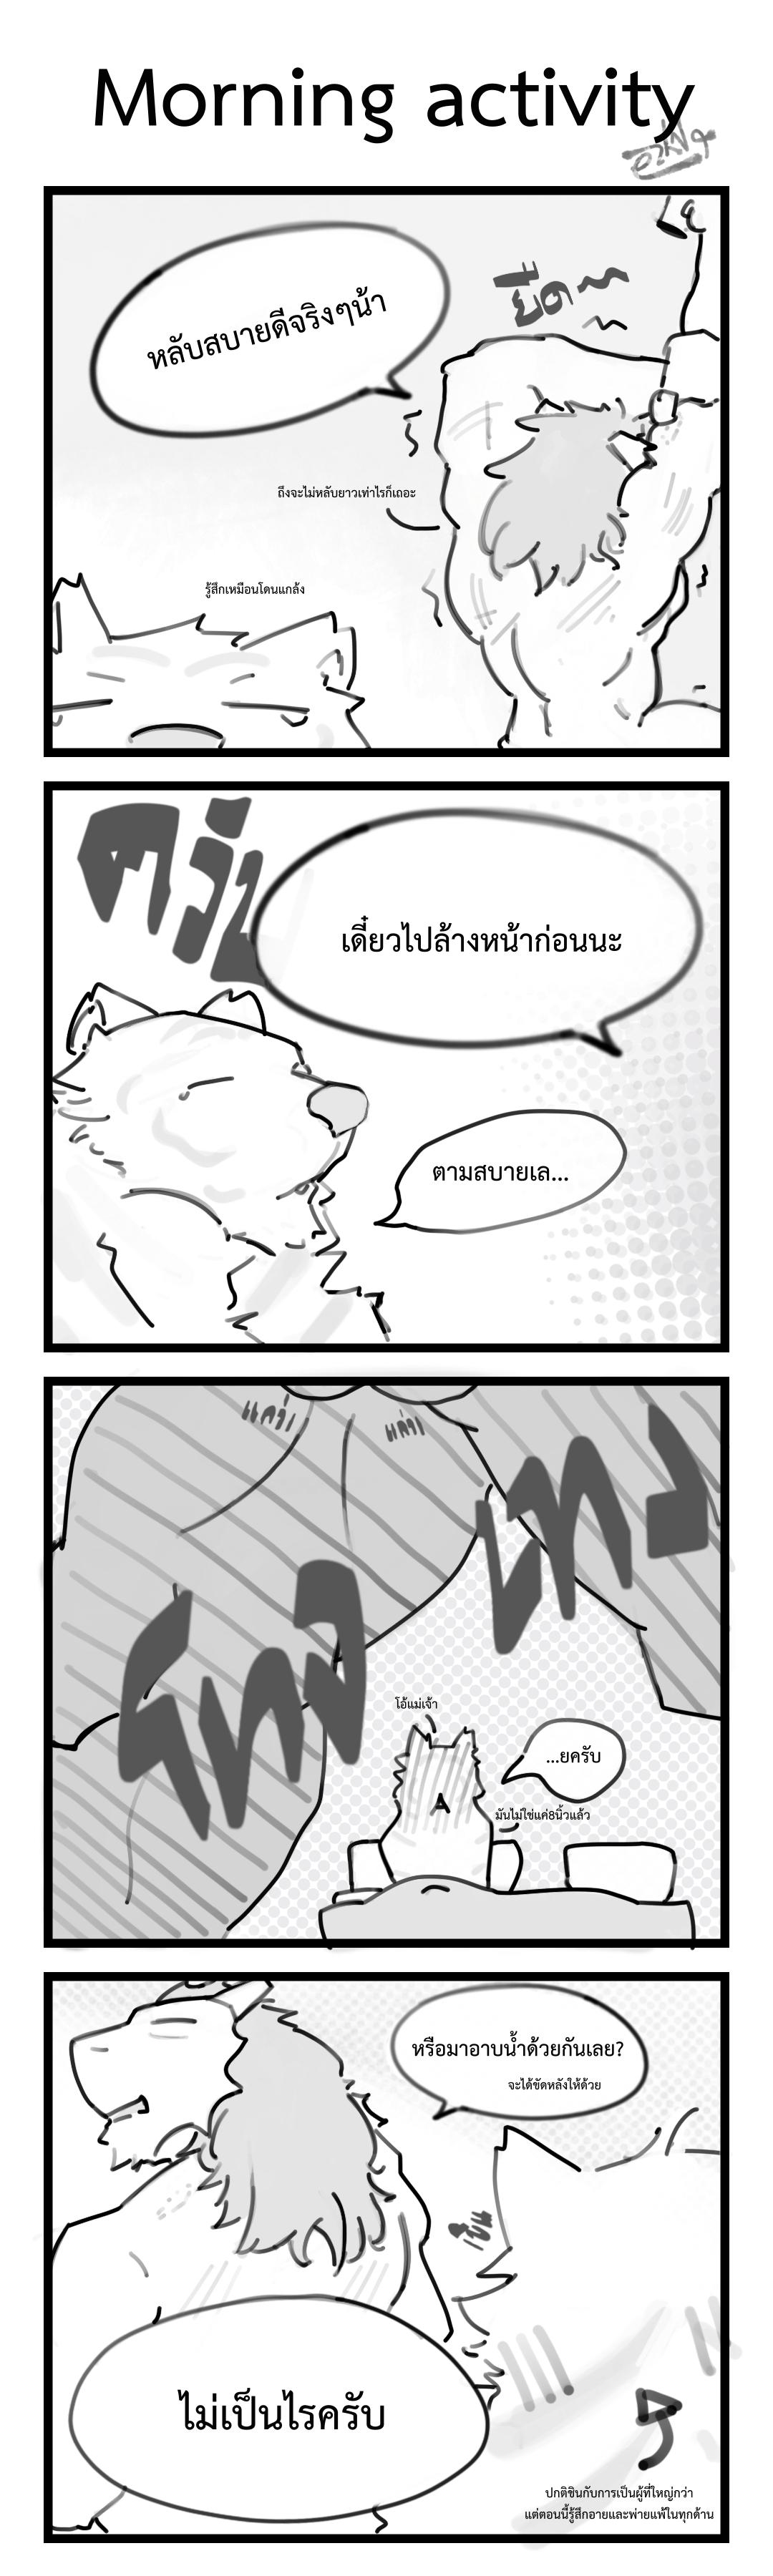 06 - Morning activity